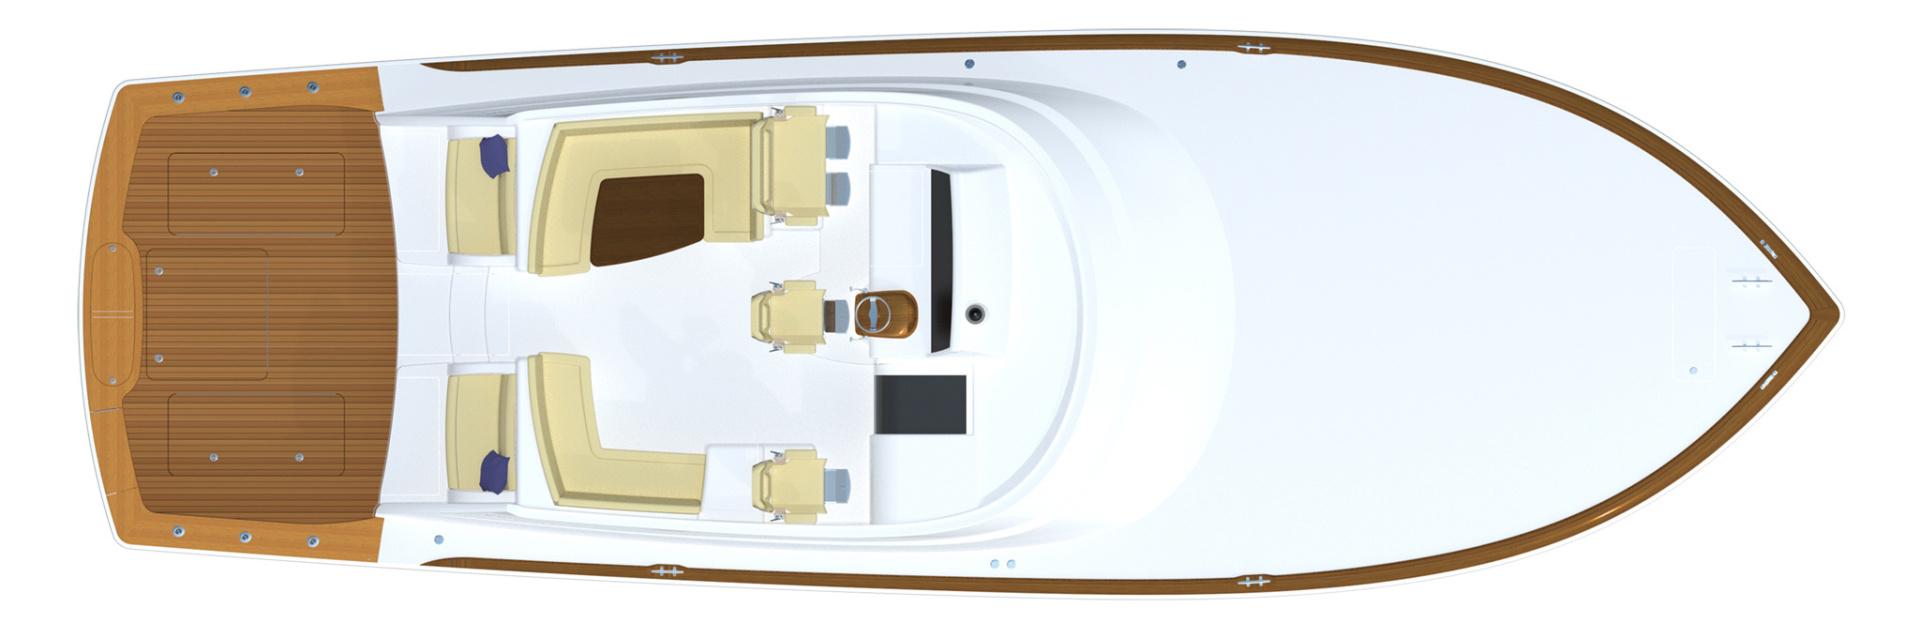 Viking 54 - Deck Layout